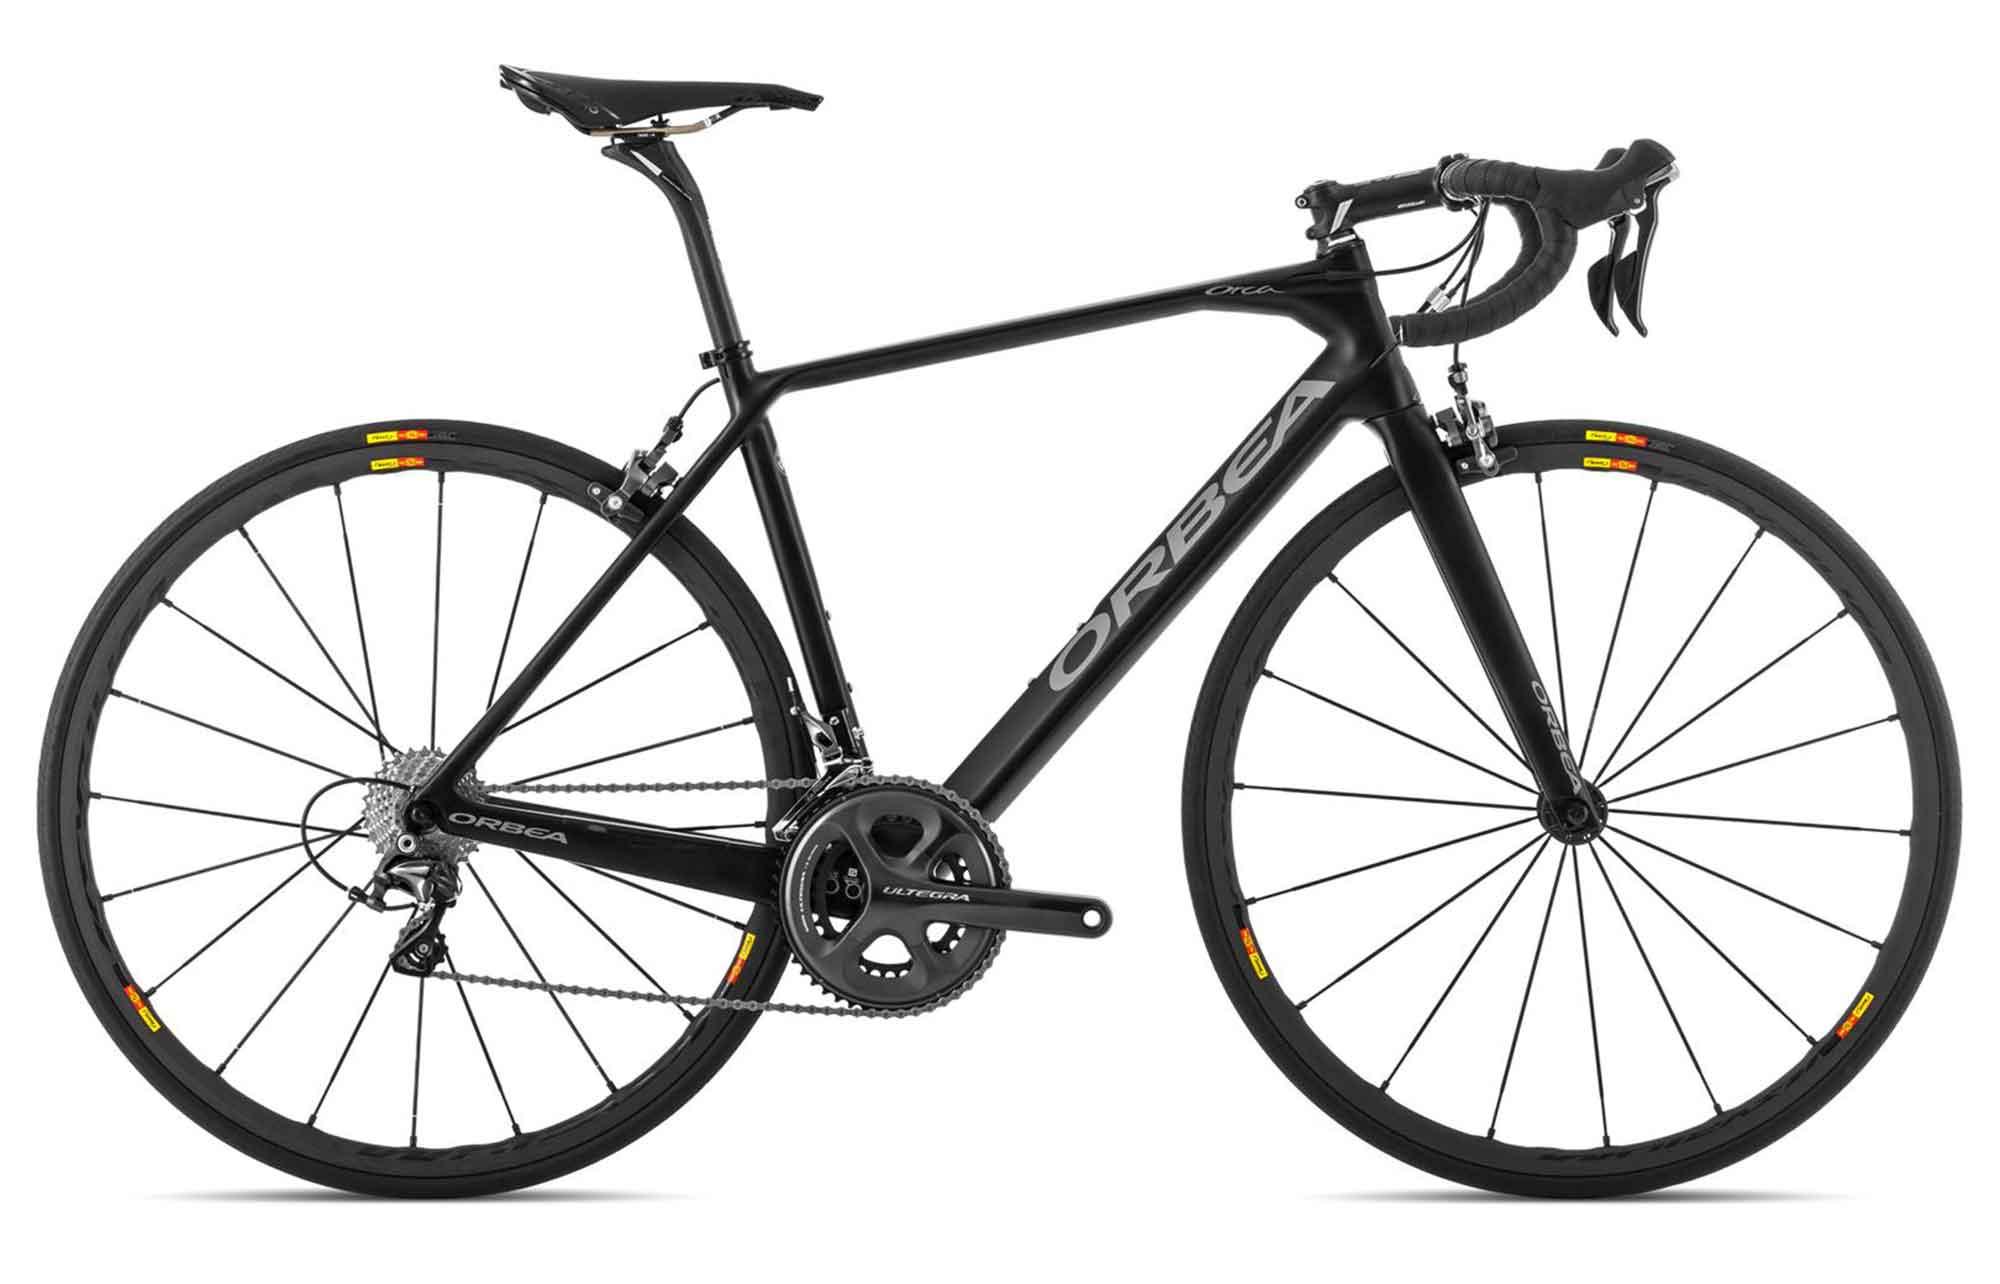 2015 Orbea Orca M Team Bike R Amp A Cycles